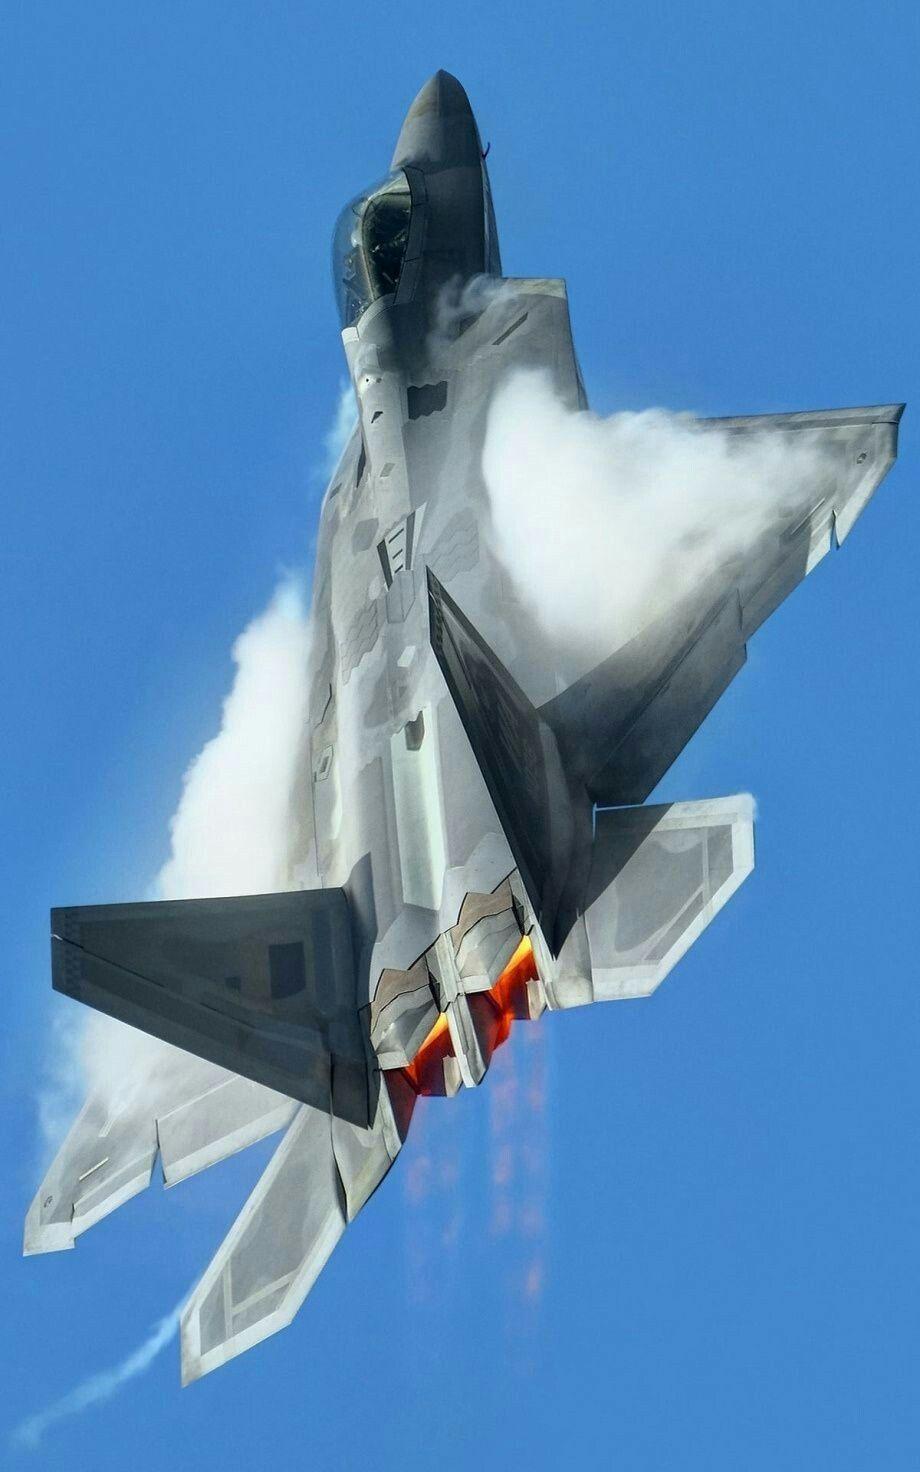 F-22 Raptor | Cool Aircraft | Airplane, Aircraft, Stealth aircraft